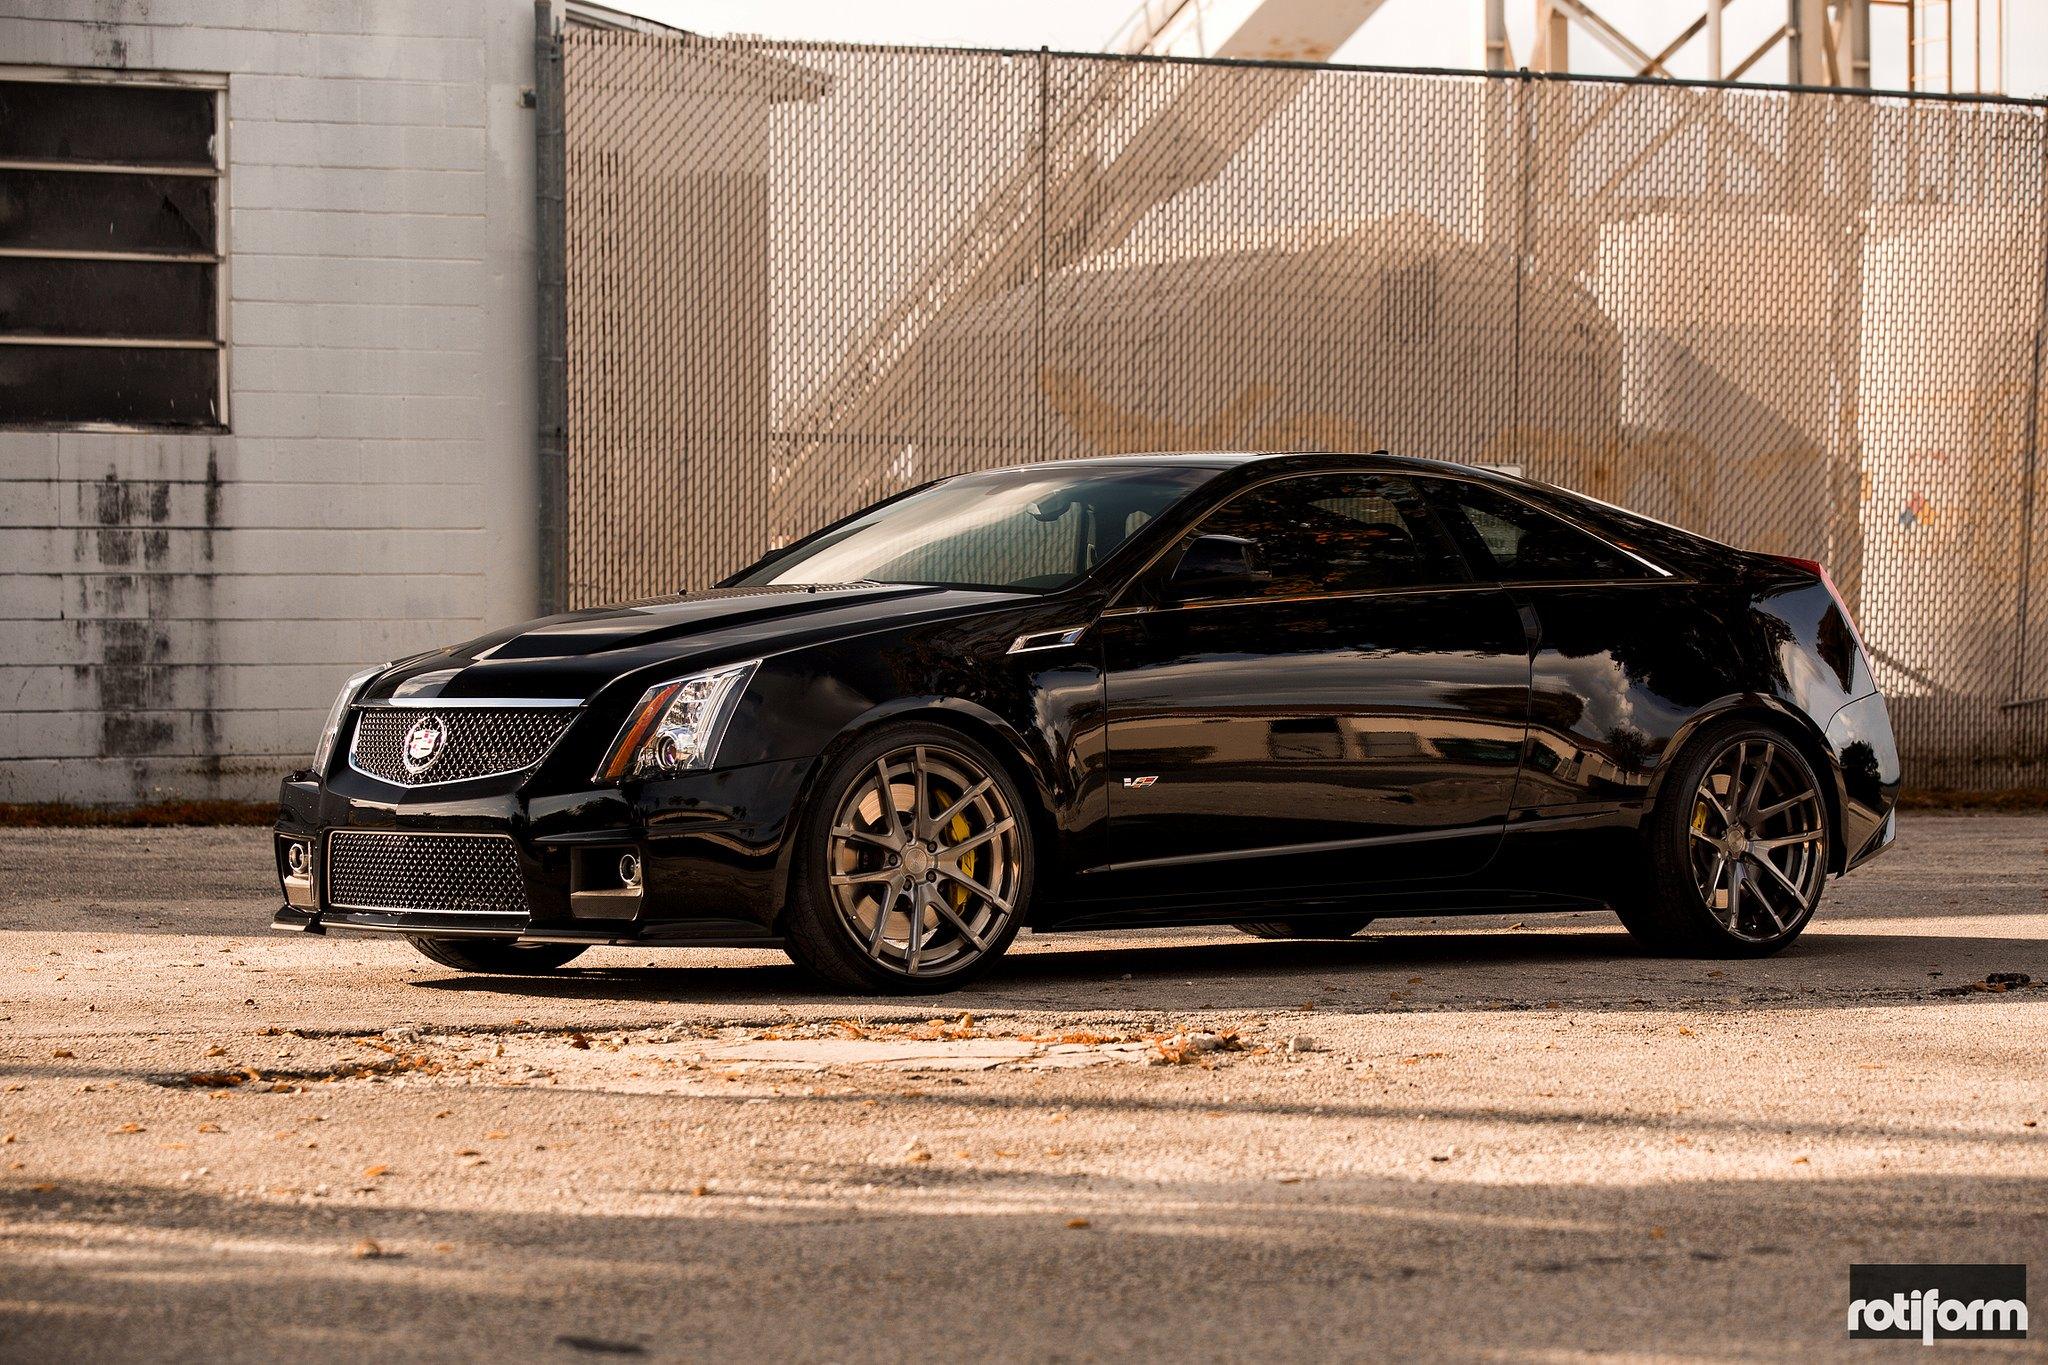 Cadillac Cts V Coupe Rocking Rotiform Sna 3pc Wheels